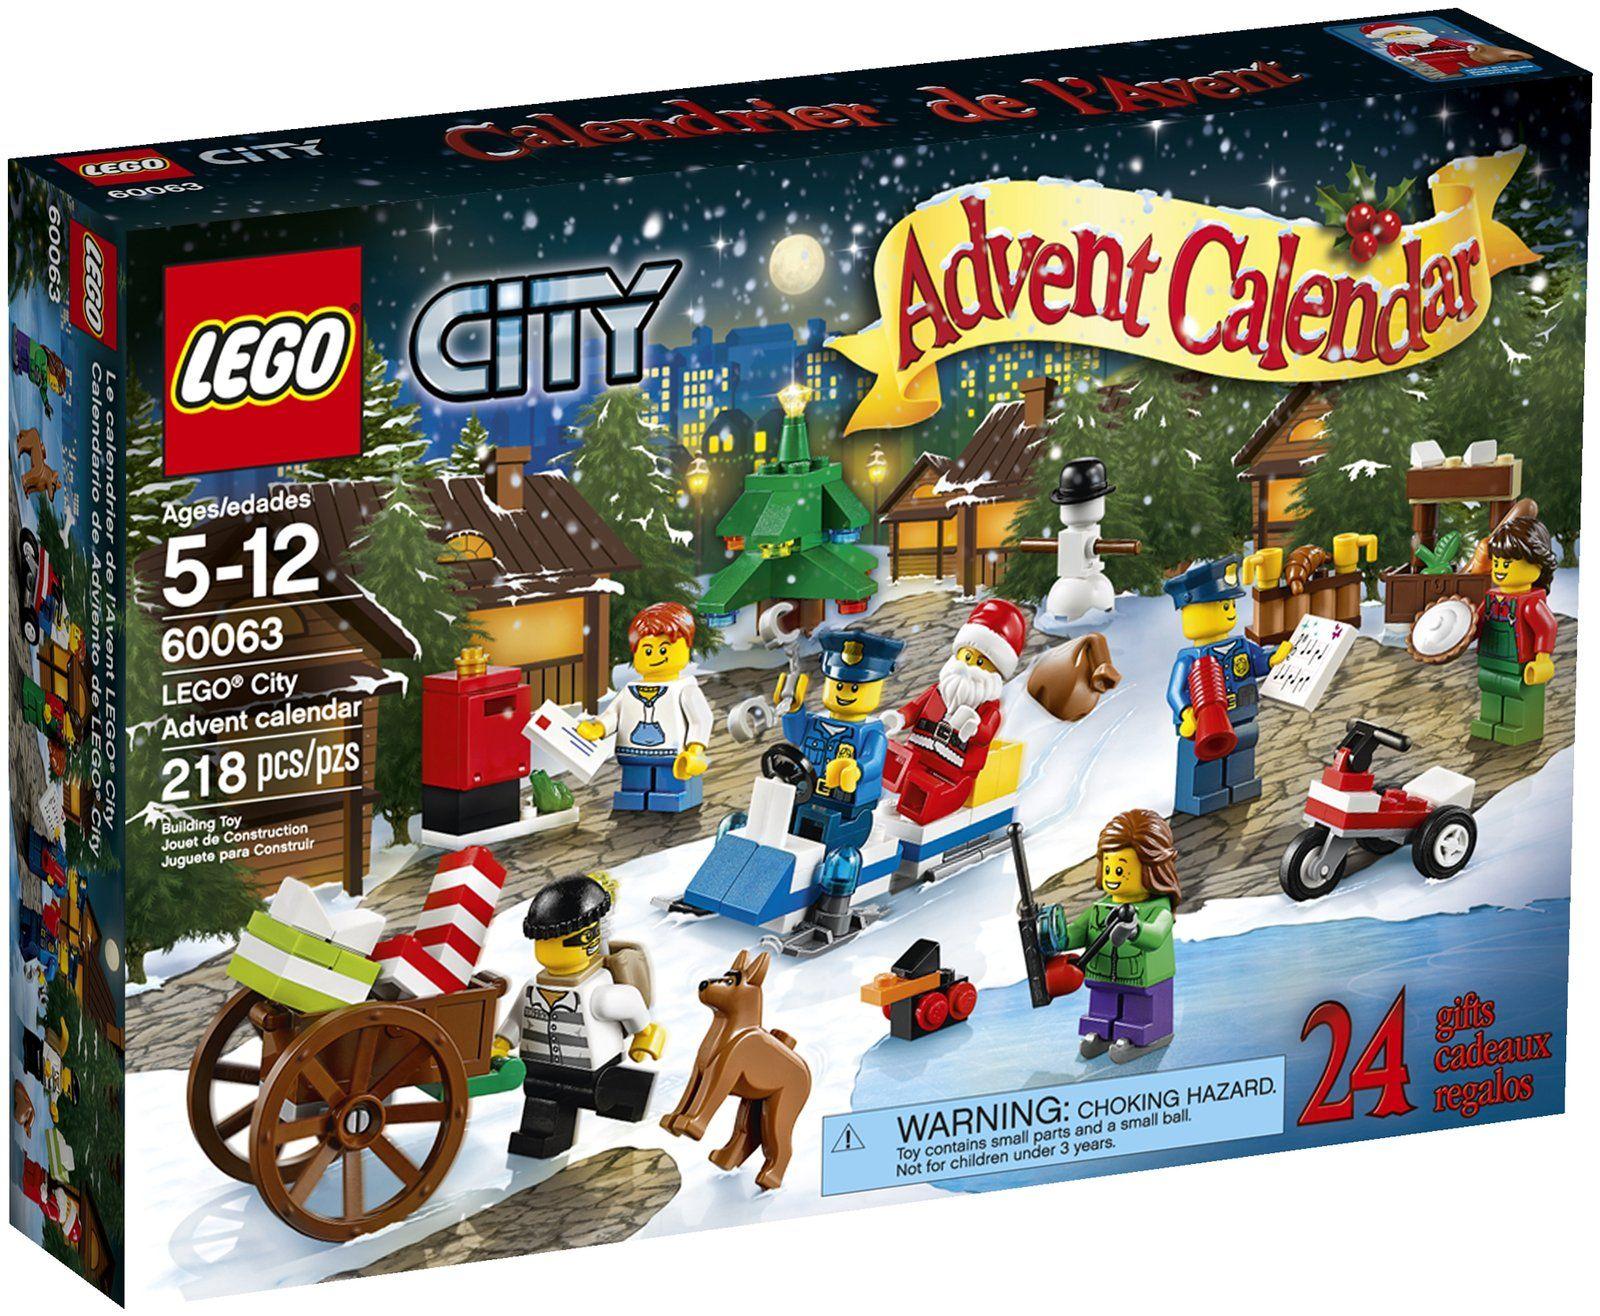 Lego Advent Calendar 24 Gifts Lego Advent Calendar Toy Advent